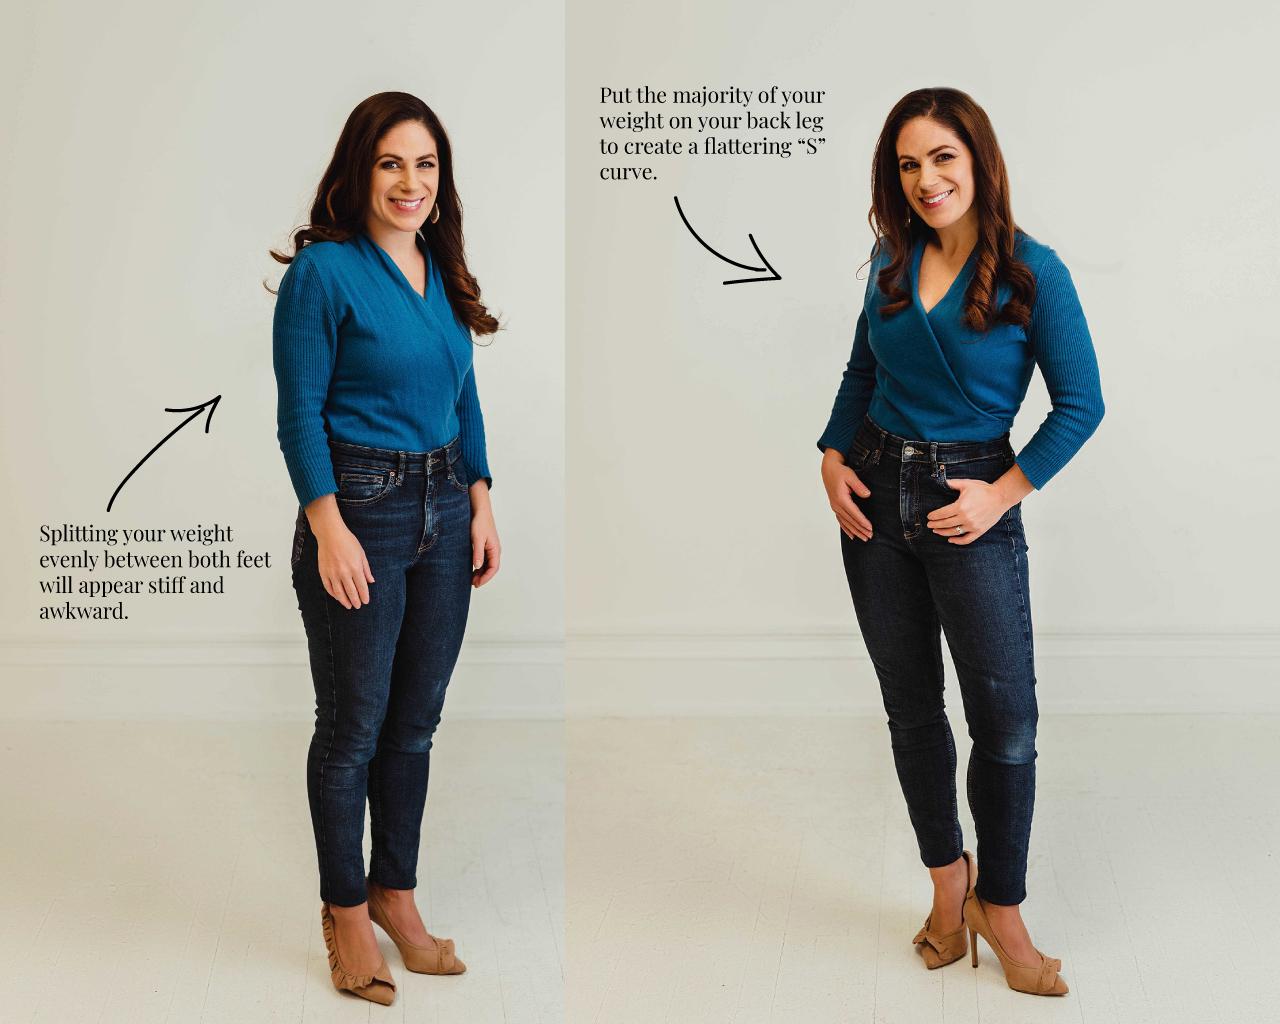 Look Better in Photos - 7 Posing Tips